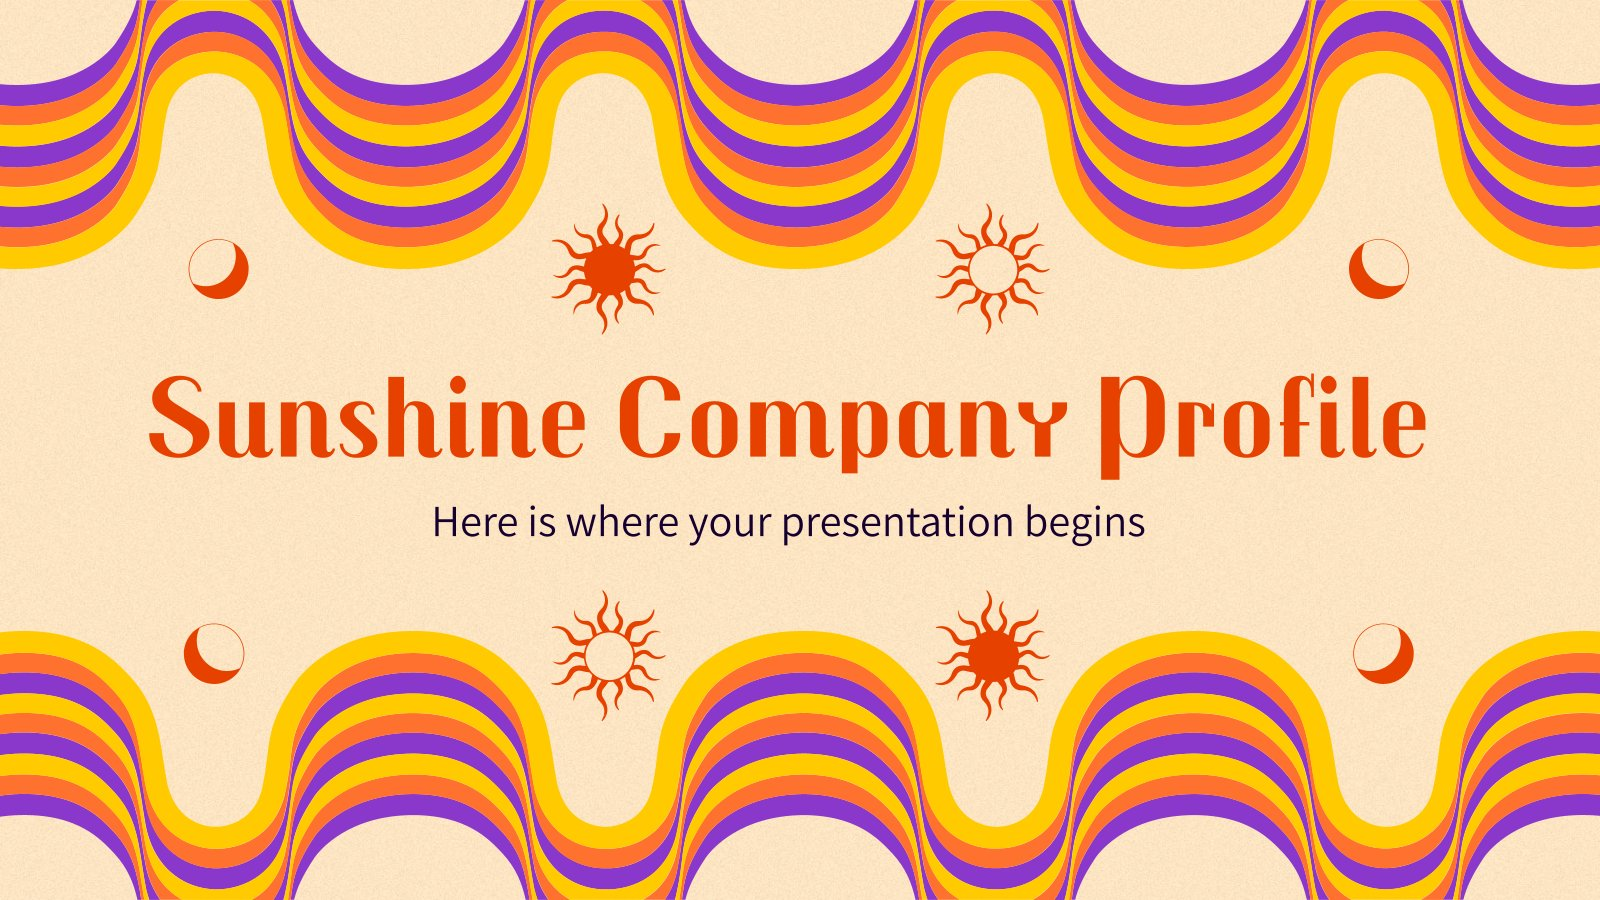 Sunshine Company Profile presentation template